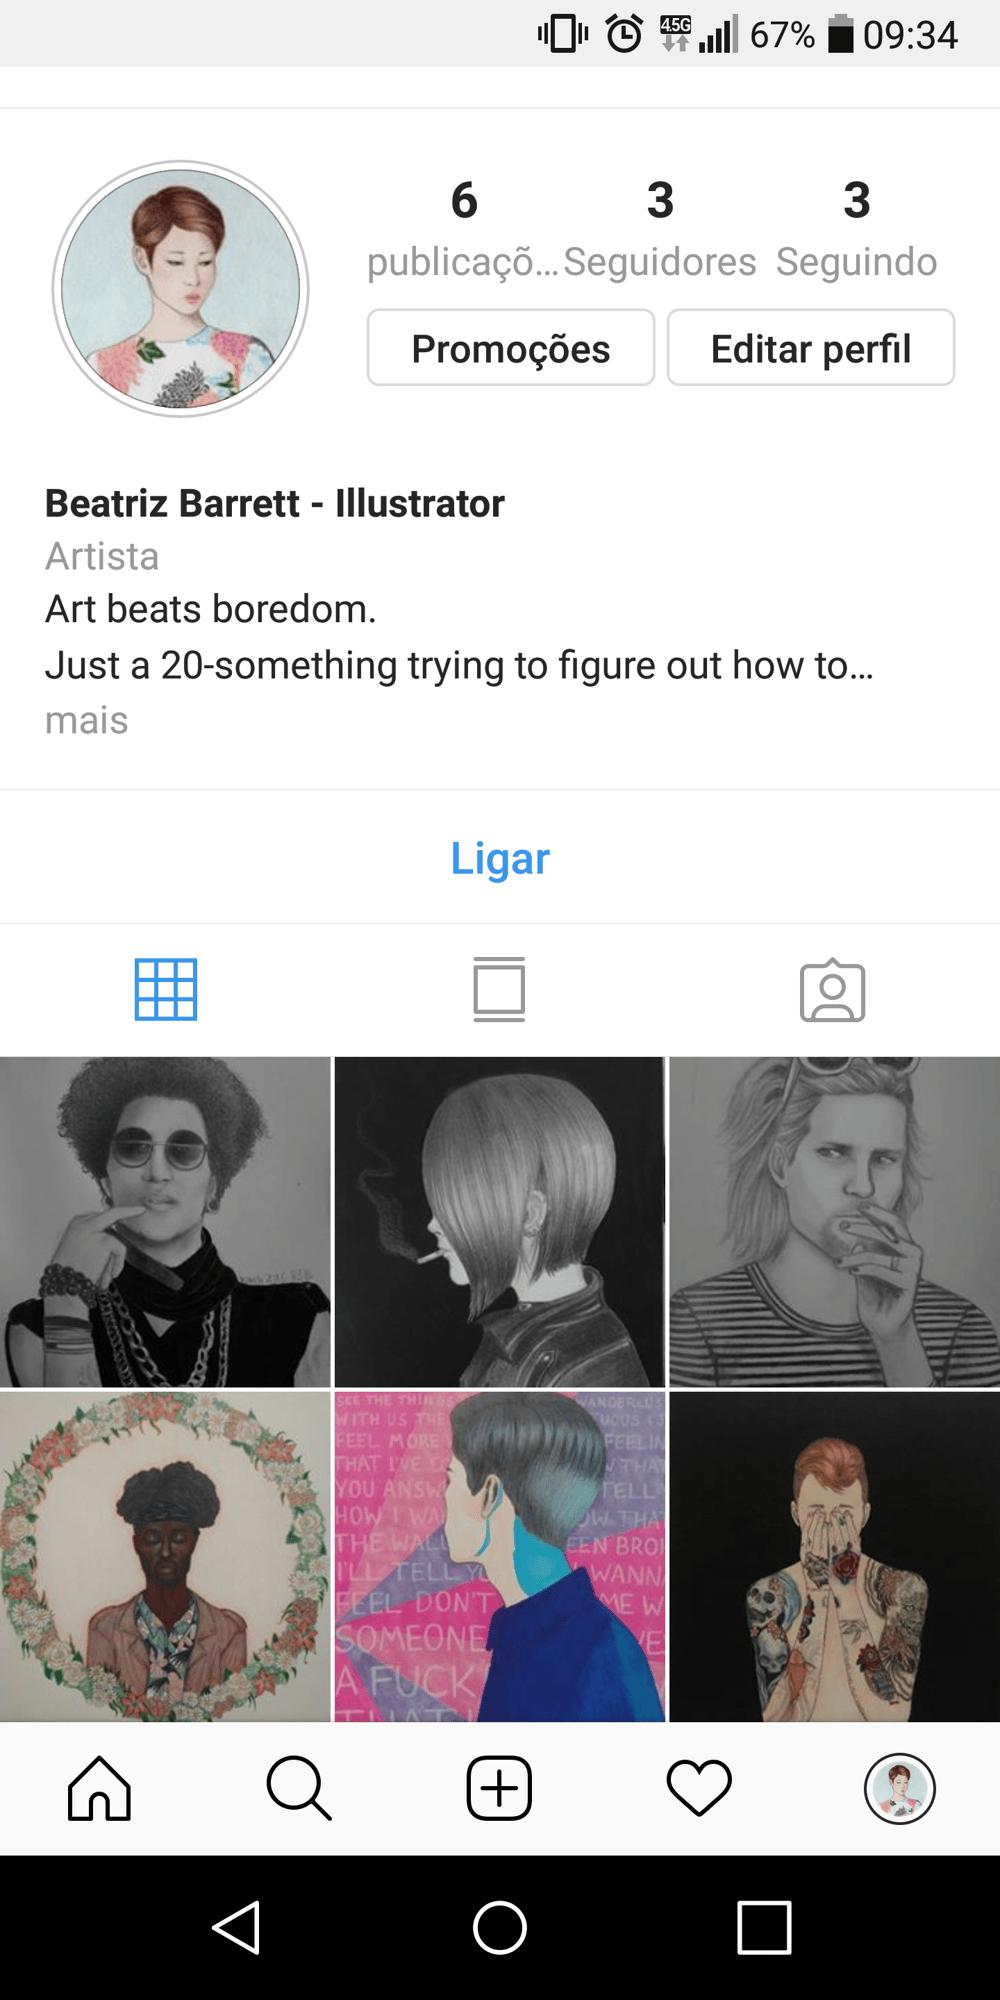 @biabarrett, my new instagram account! - image 1 - student project